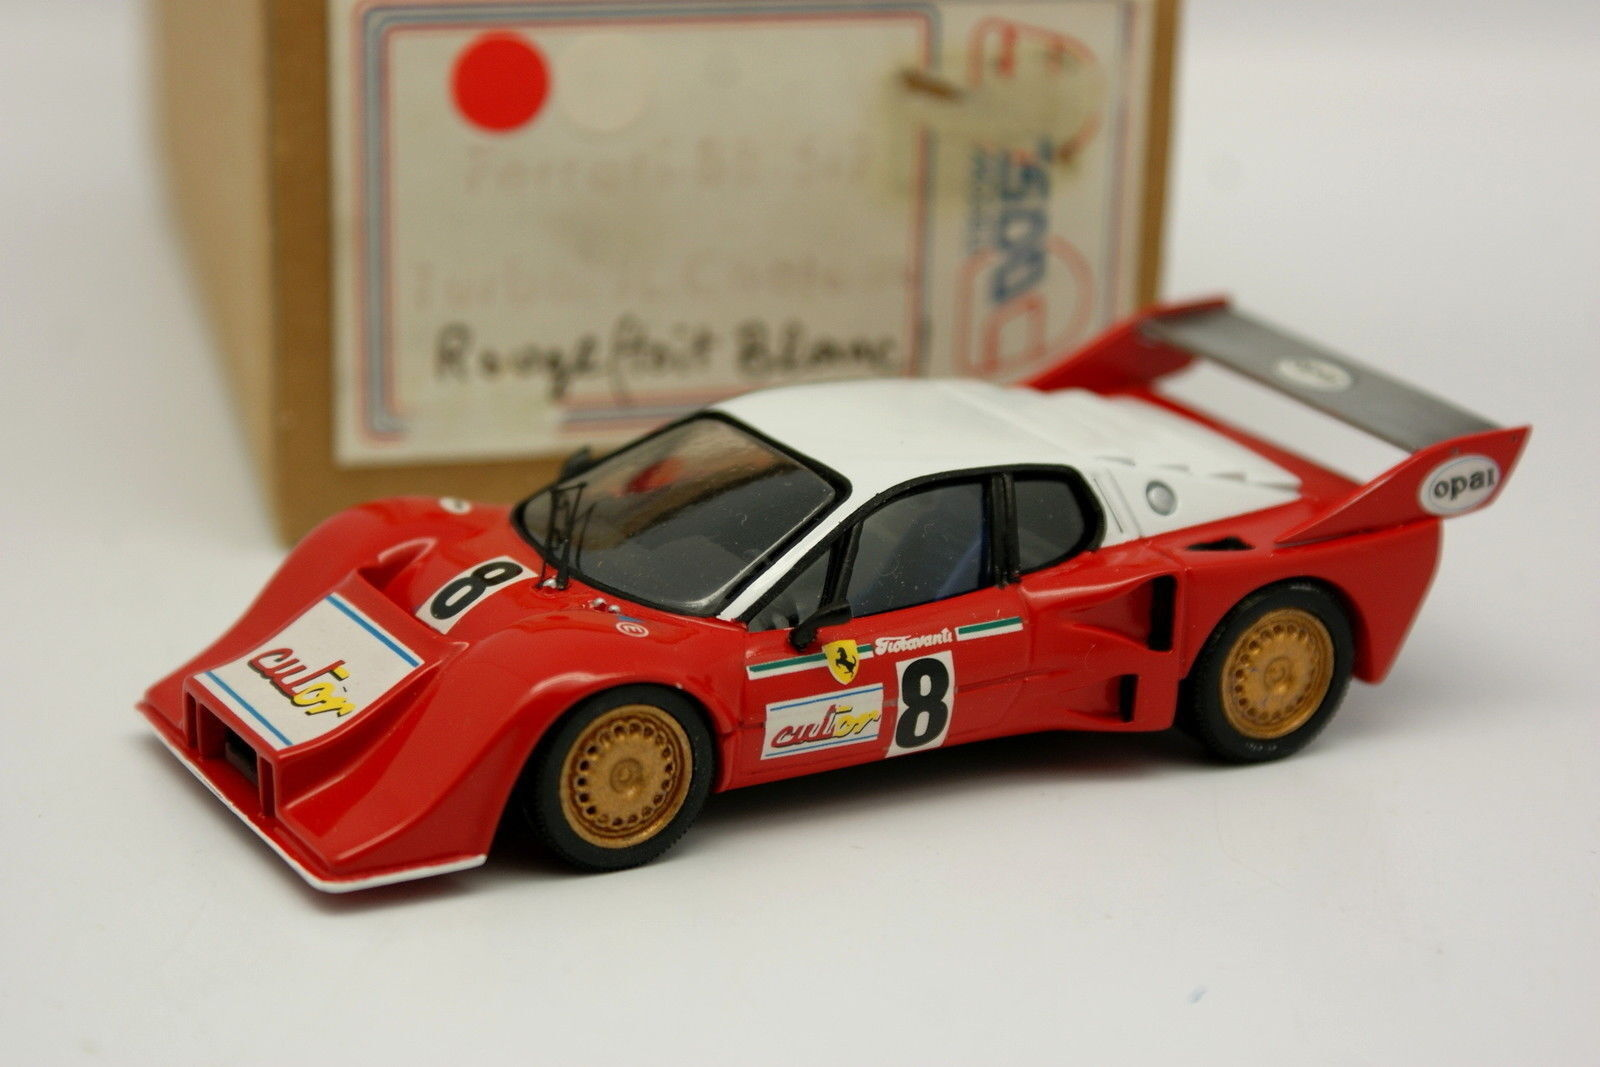 ESDO Kit Monté 1 43 - Ferrari BB 512 Turbo Chateau